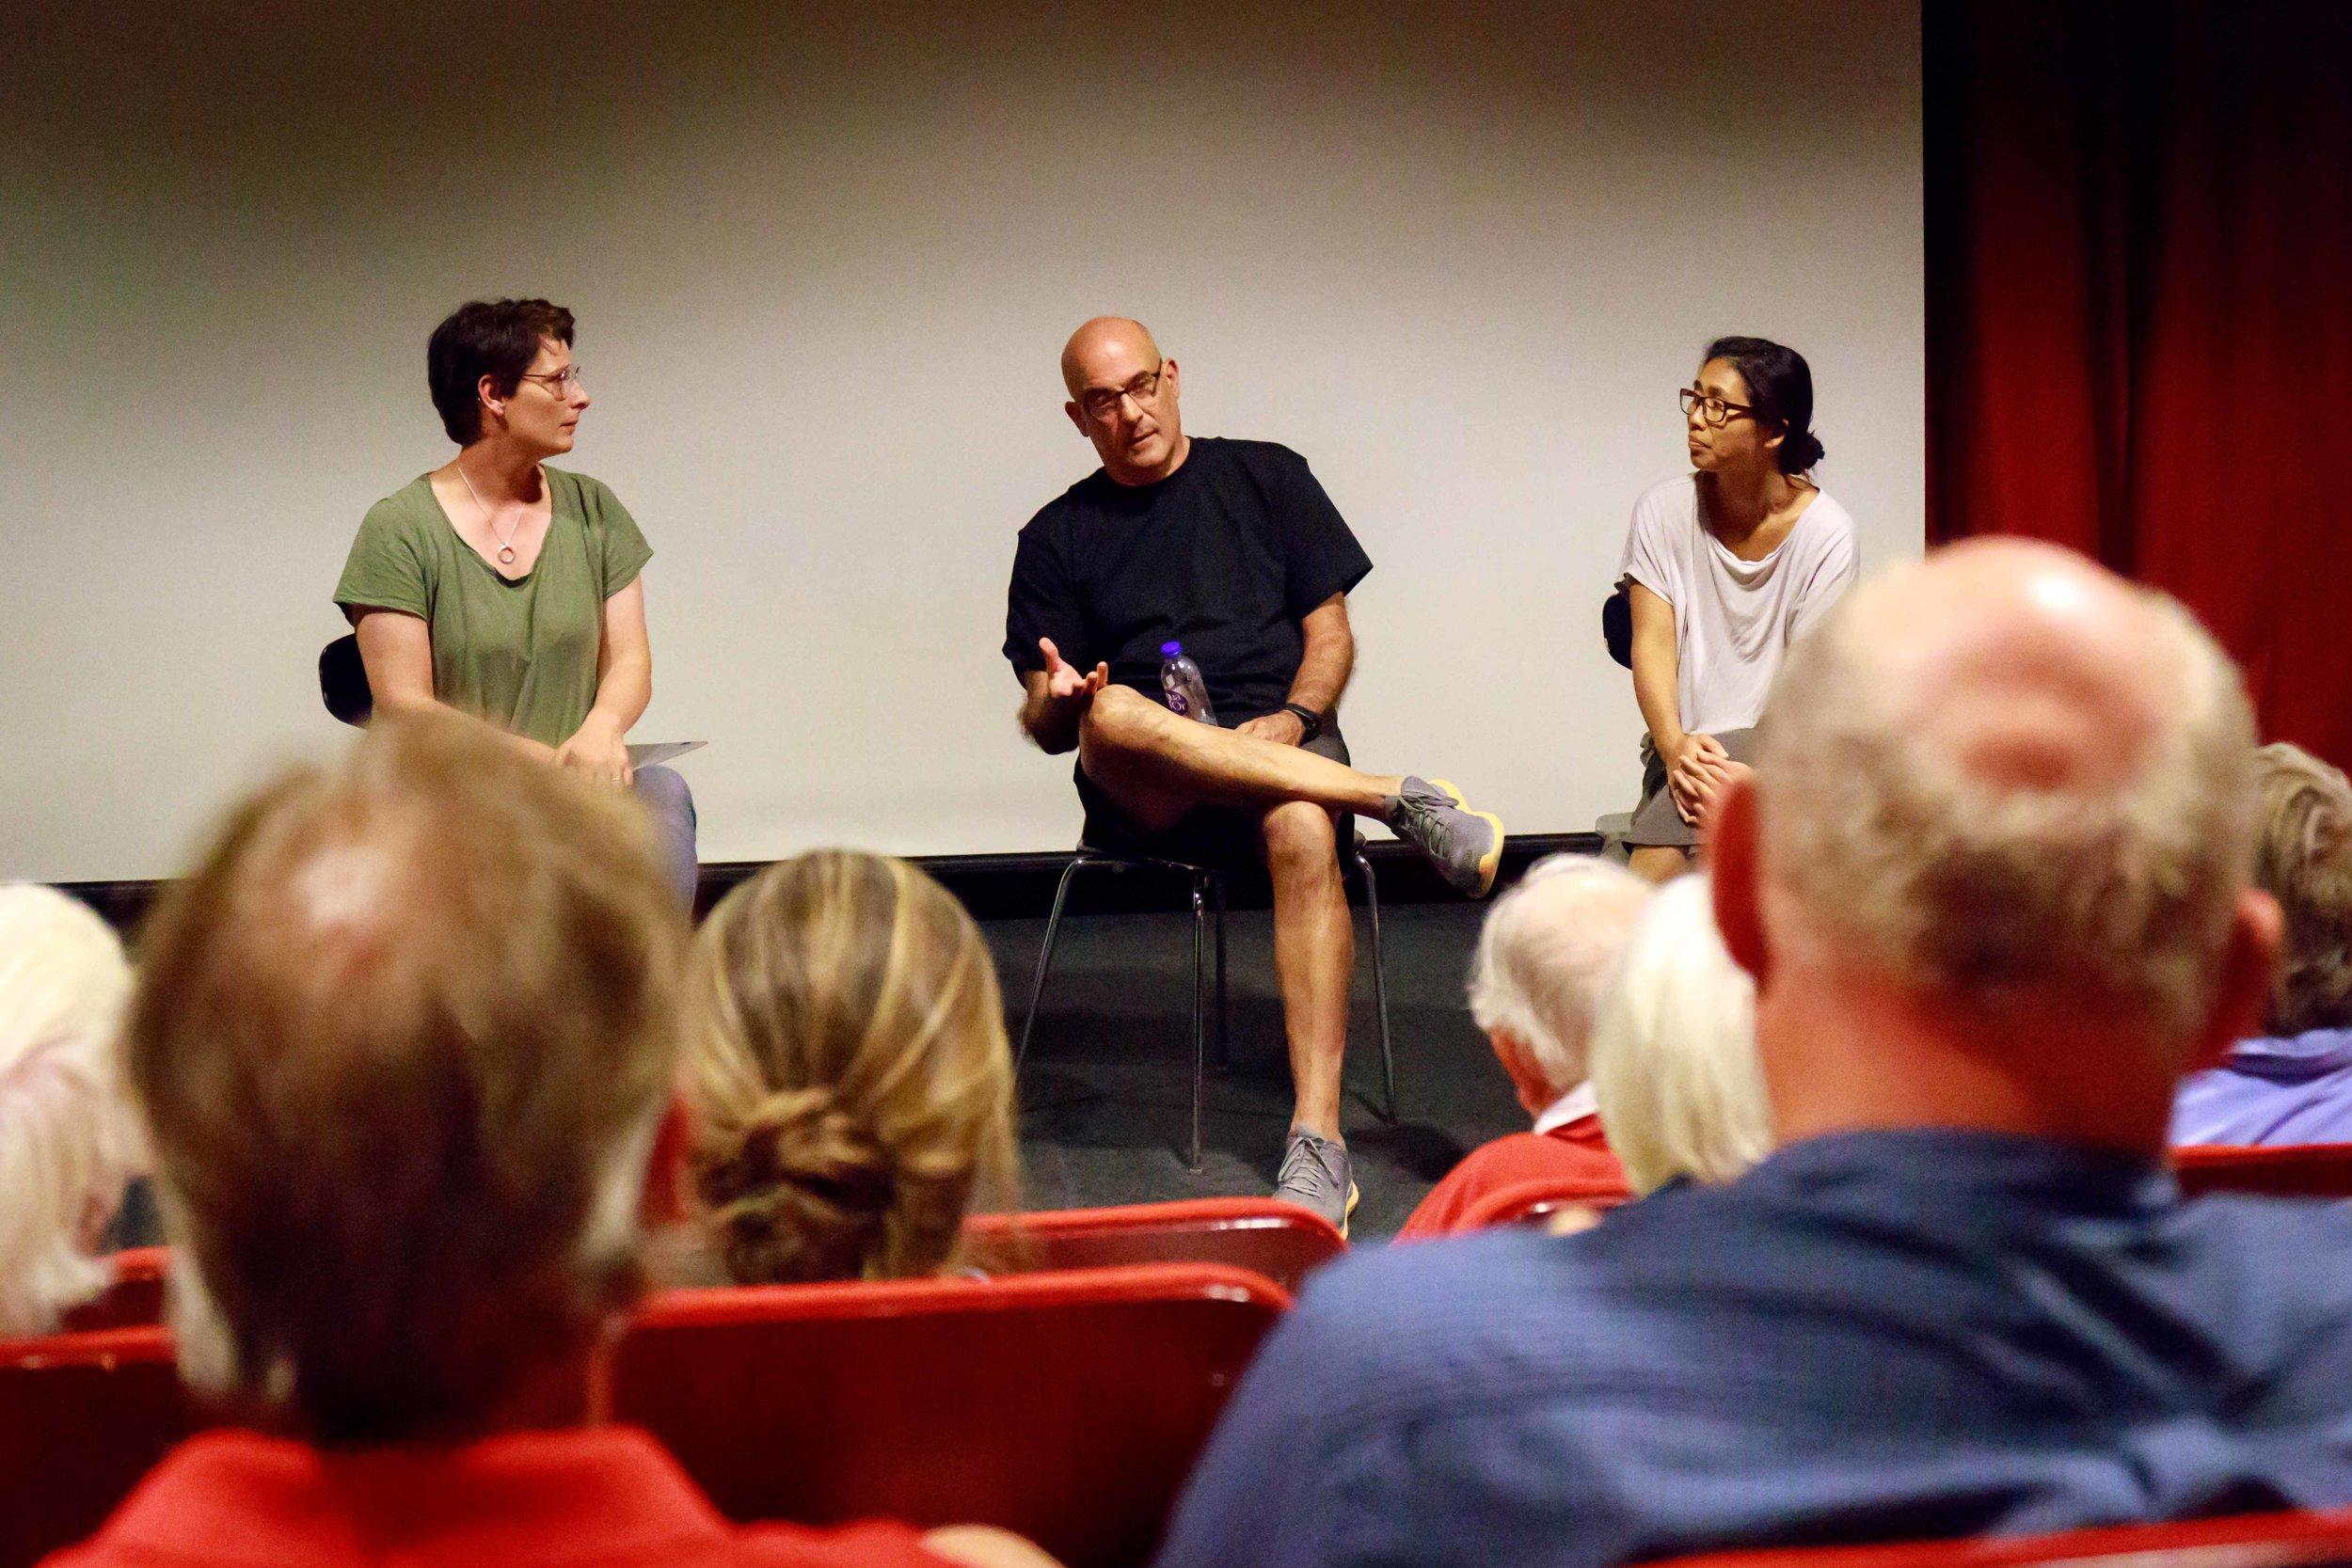 talk after the film screening